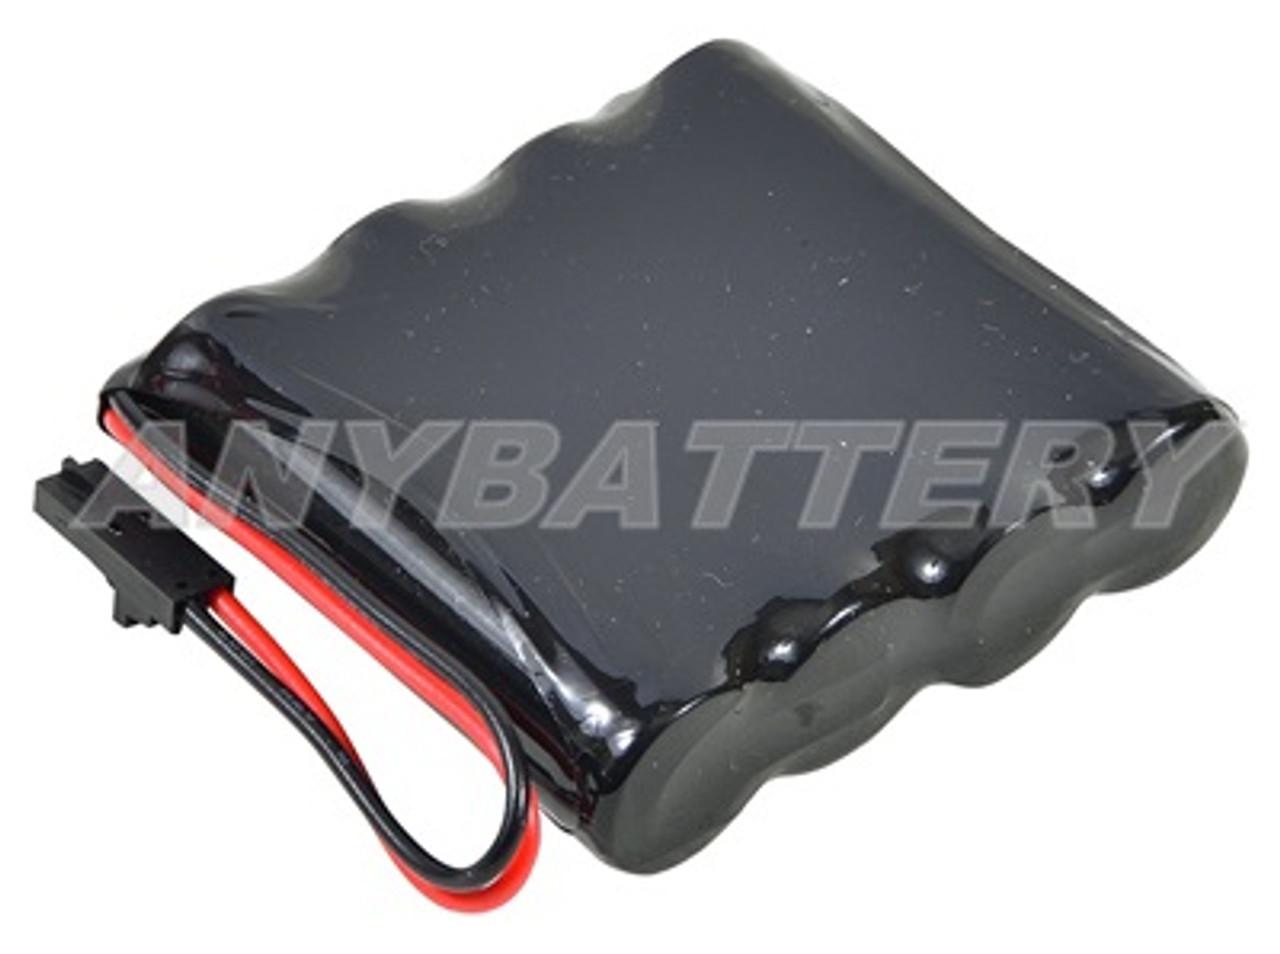 Synergy Digital SDDC-A1118, VPD-BB Battery, VPDBB Battery